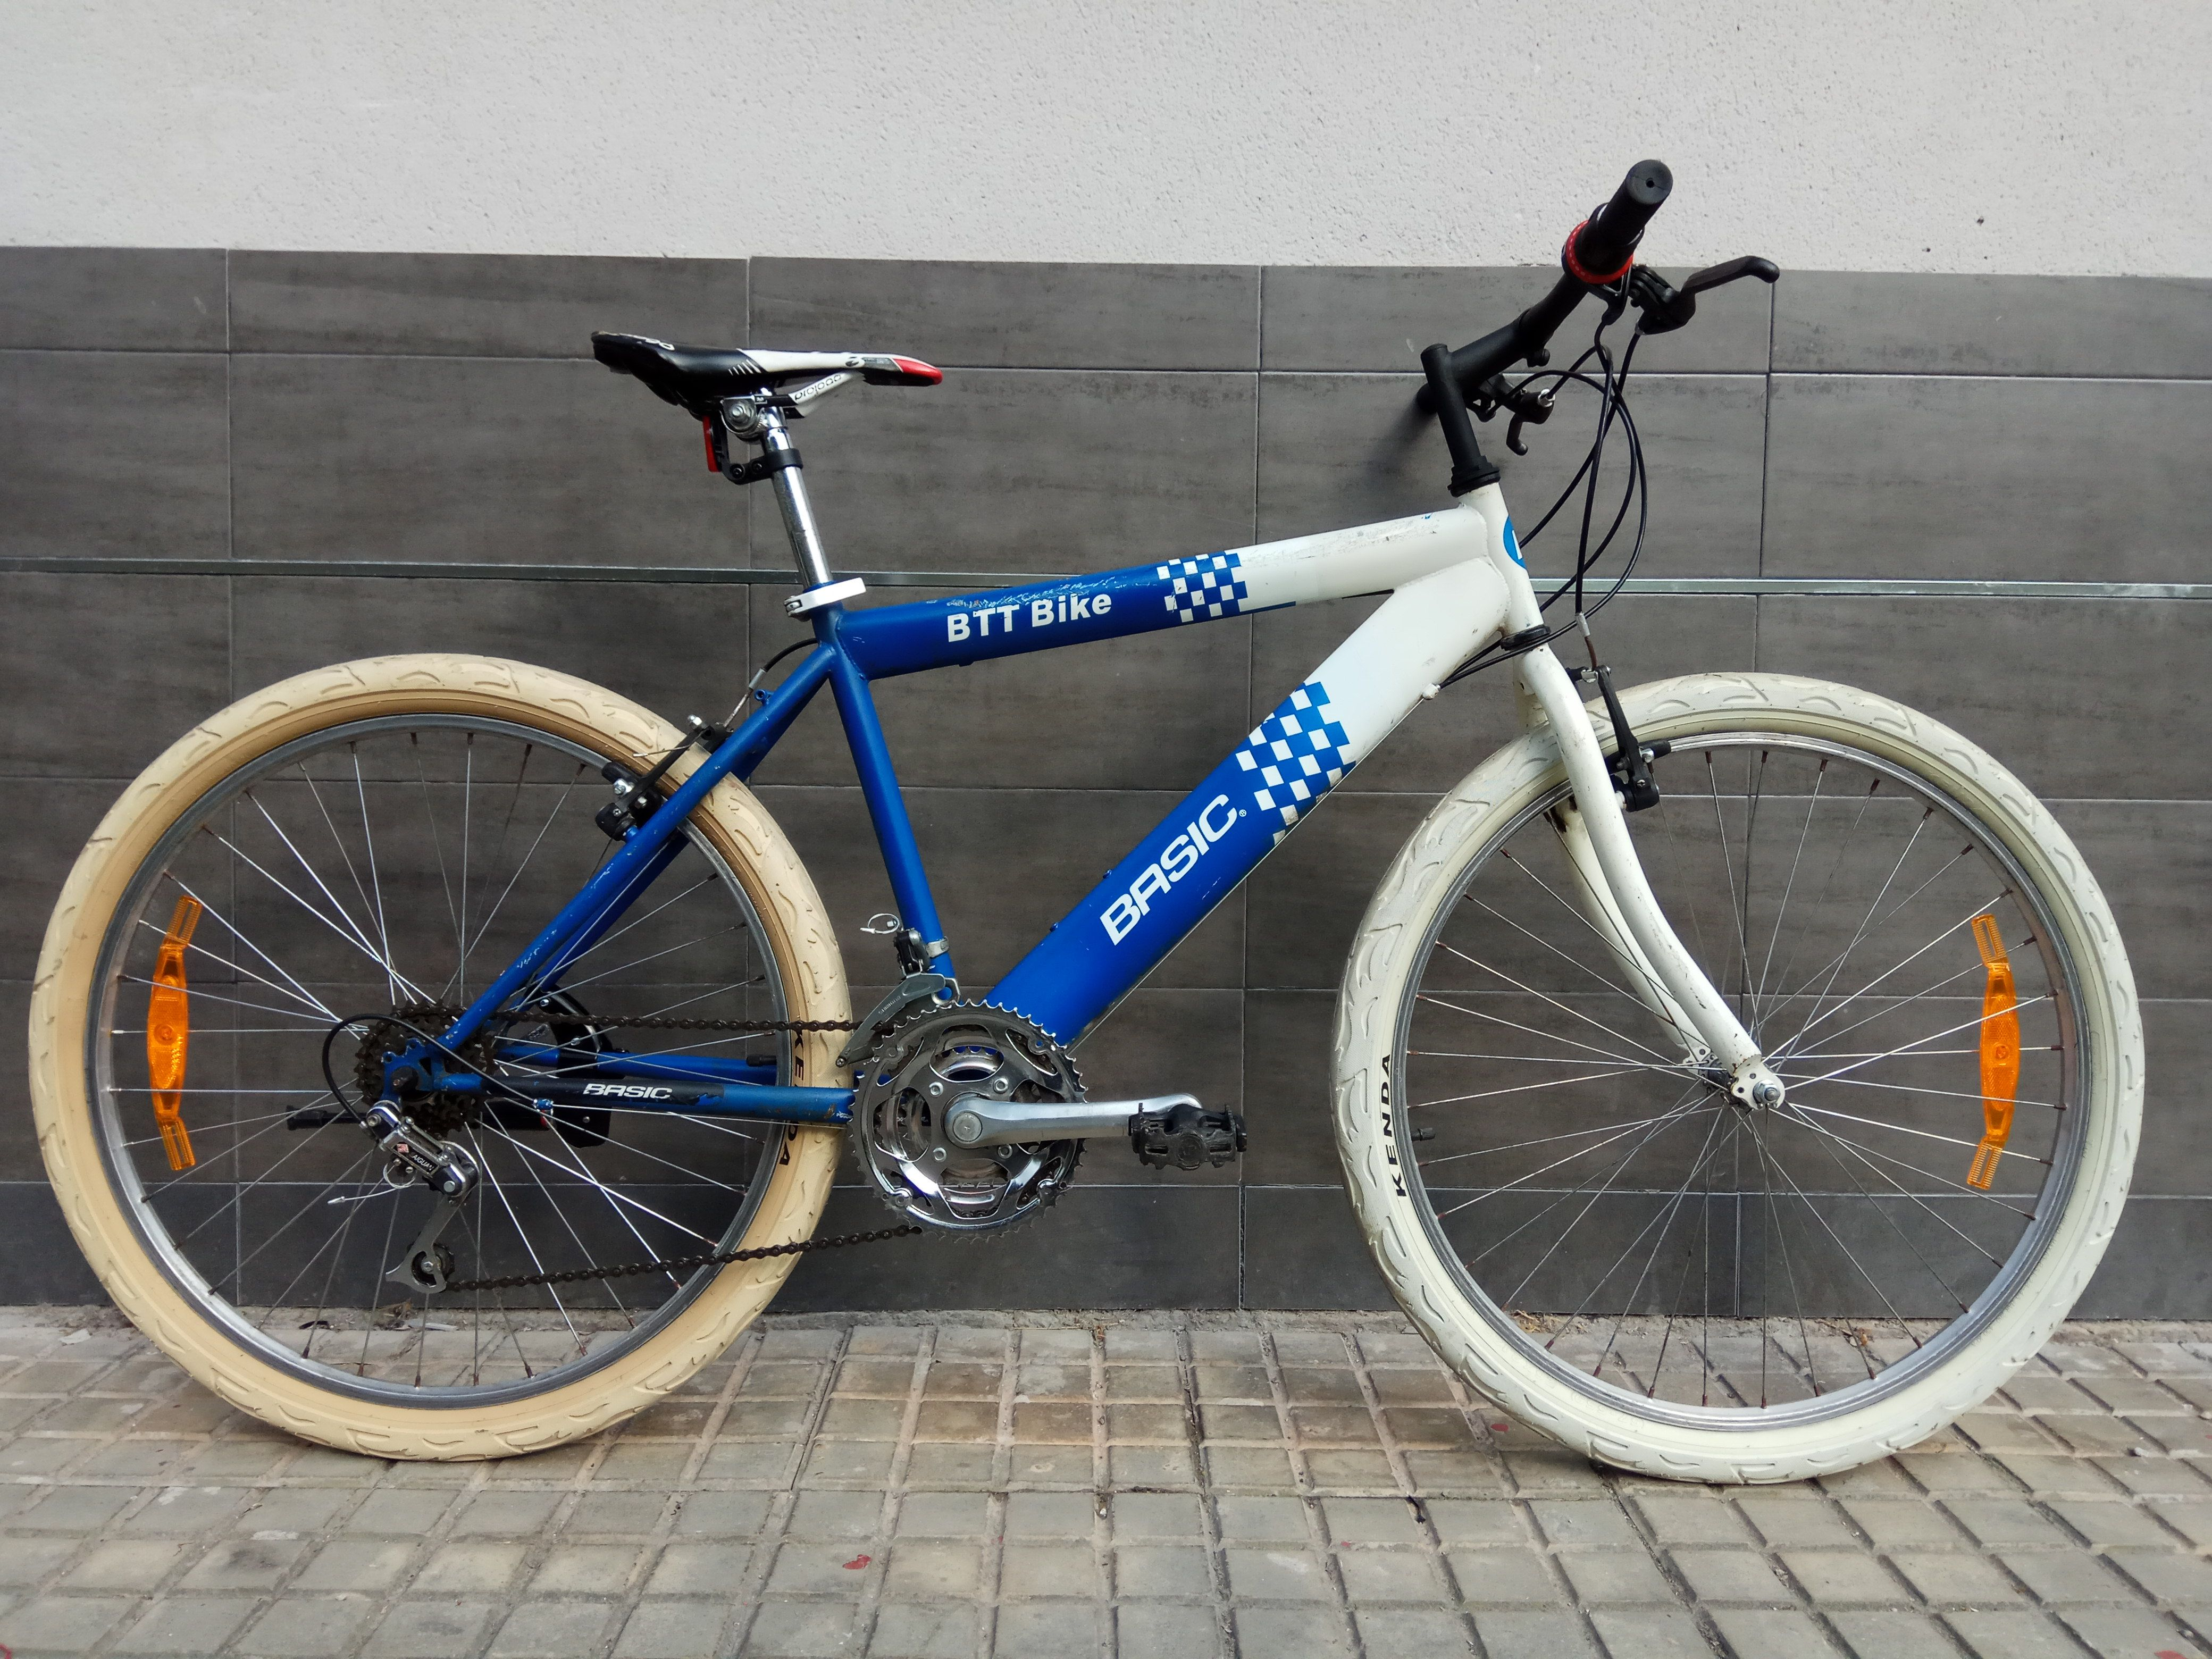 Bicicleta Basic Revisada y Ajustada 80€ MARCA: Basic MODELO: Btt ...